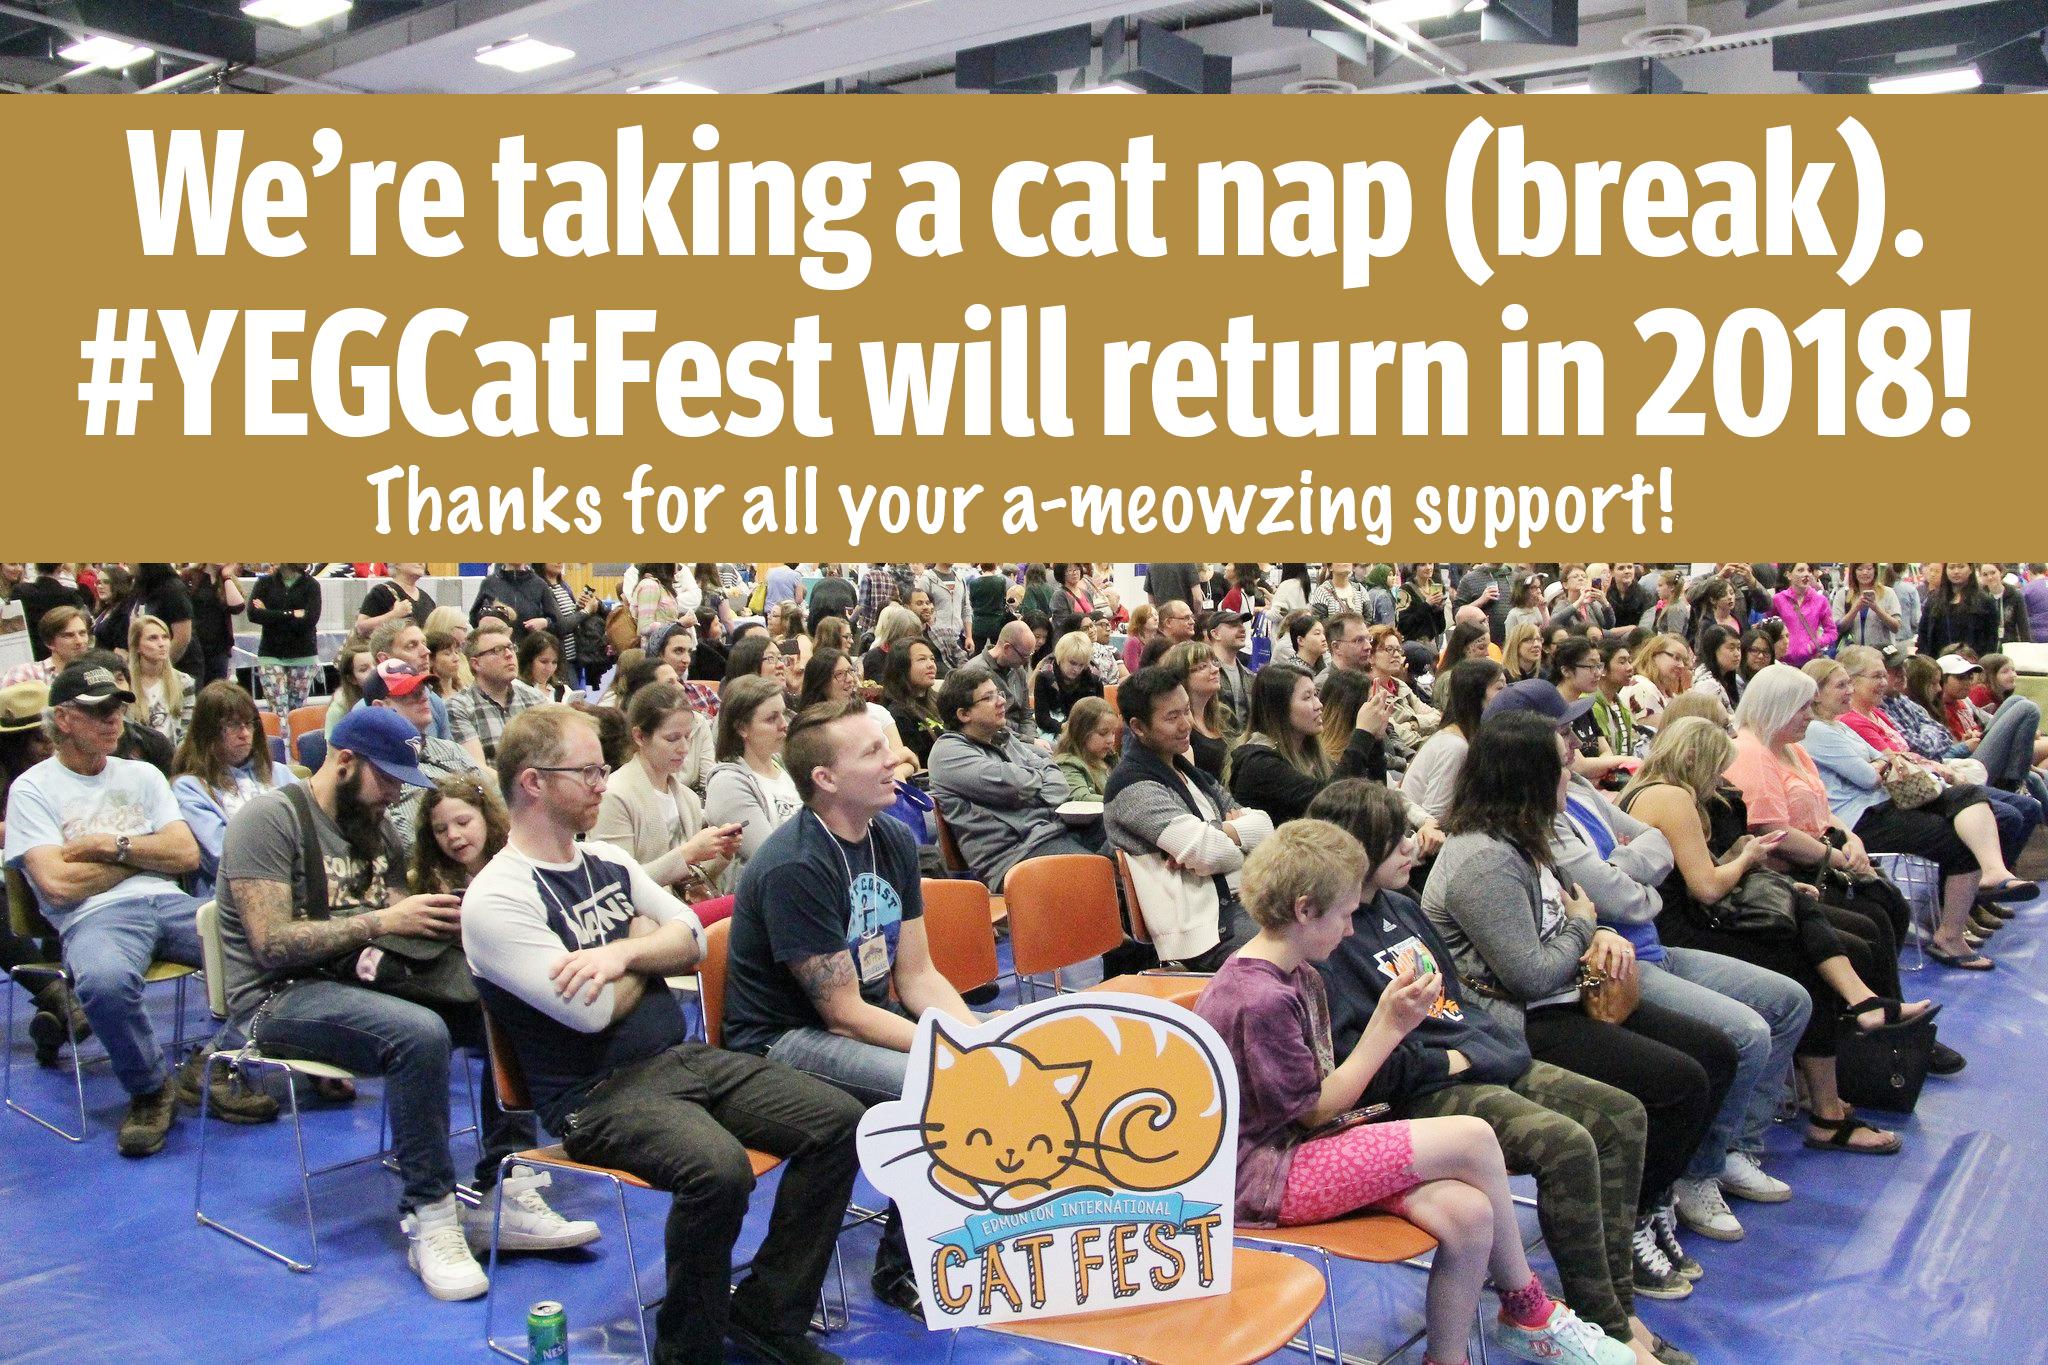 Cat Festival Break